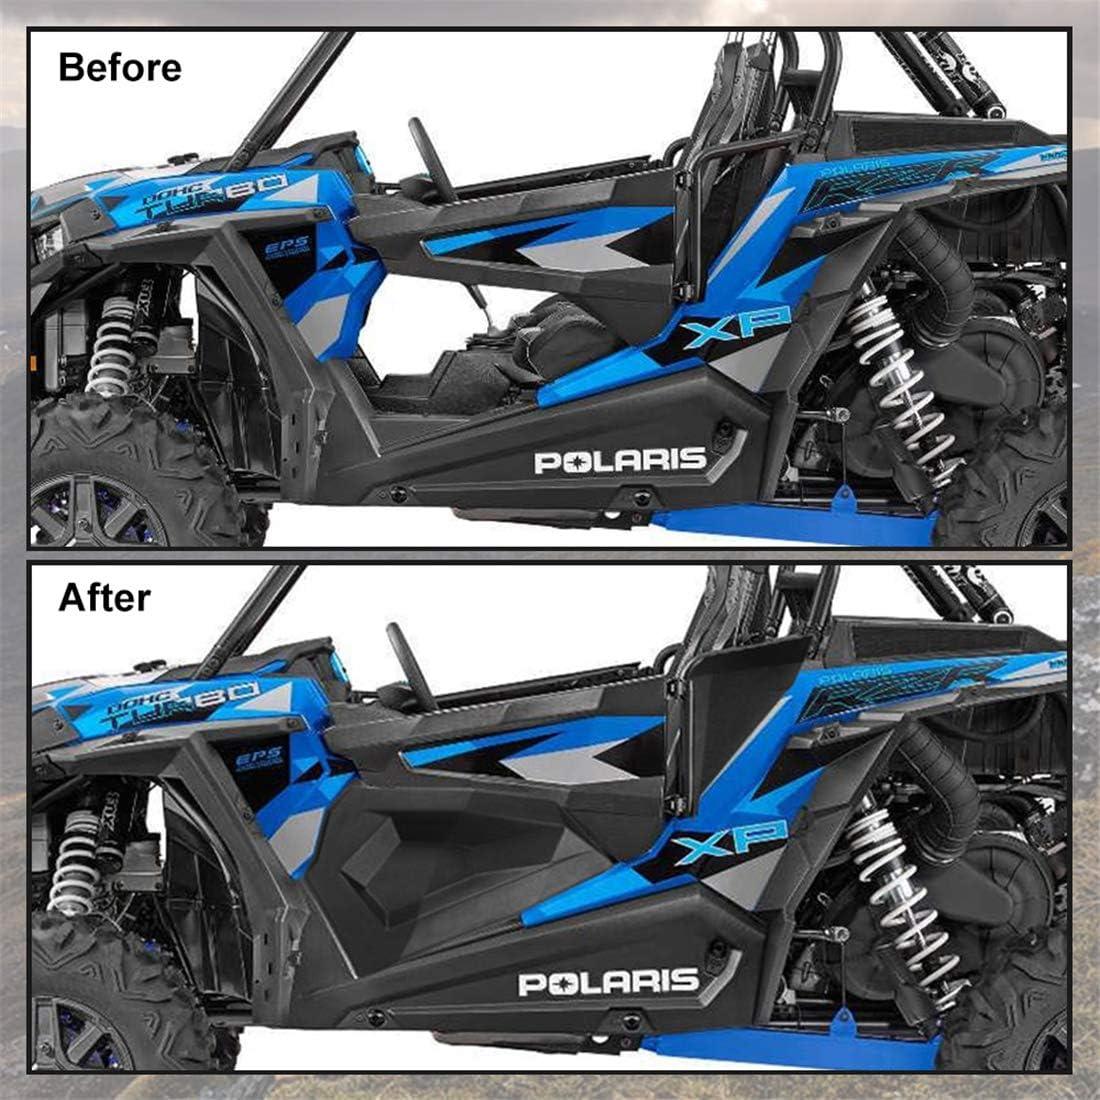 KIWI MASTER Lower Half Door Inserts Panels Compatible for 2014-2020 Polaris RZR XP 1000 900 S Turbo EPS 2 Door 60 inch Models Black 2879509